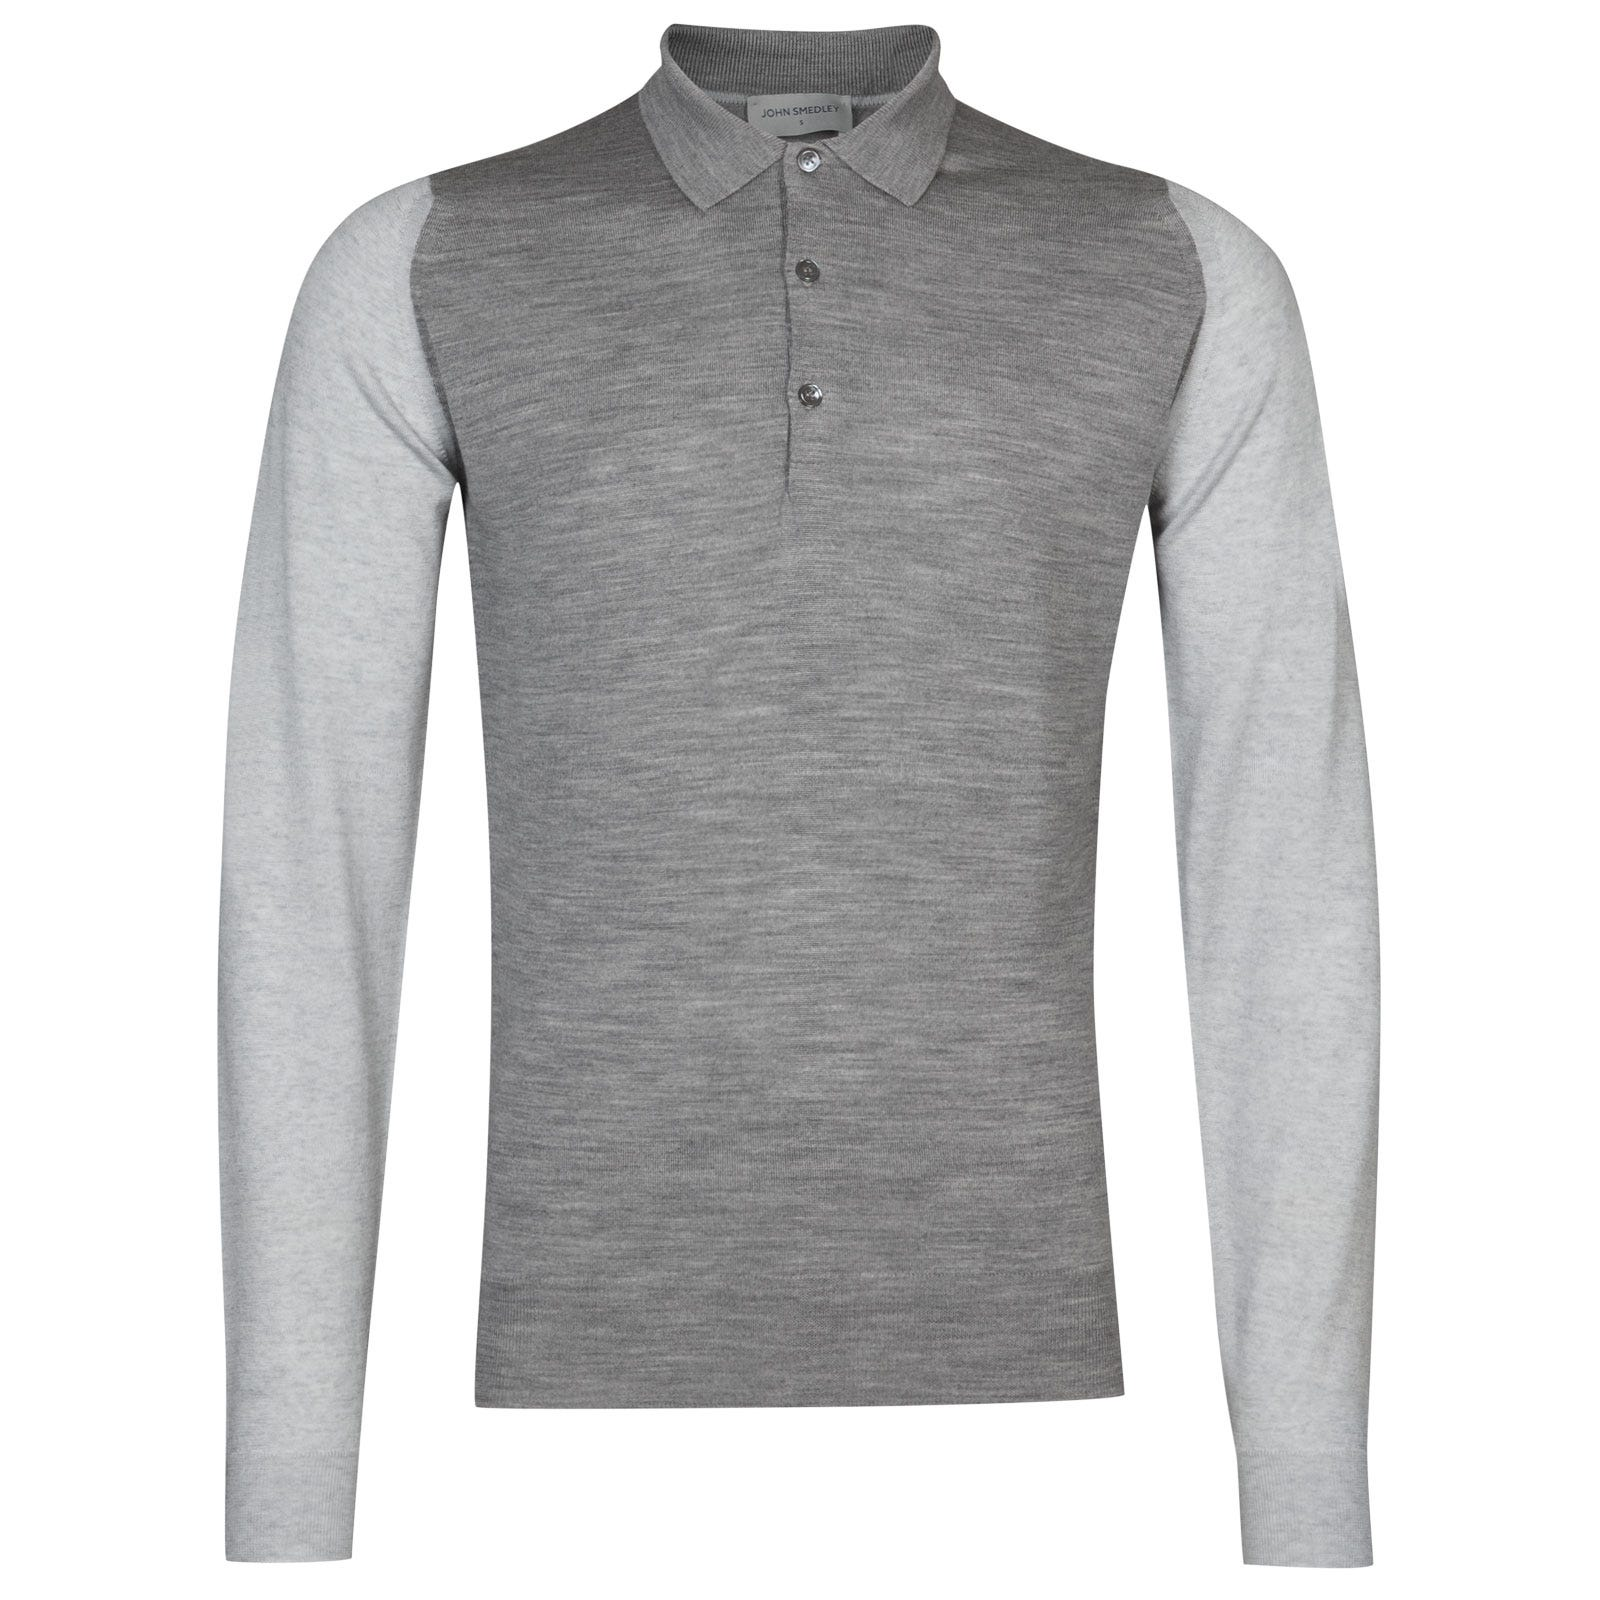 John Smedley Brightgate Extra Fine Merino Shirt in Silver-XXL